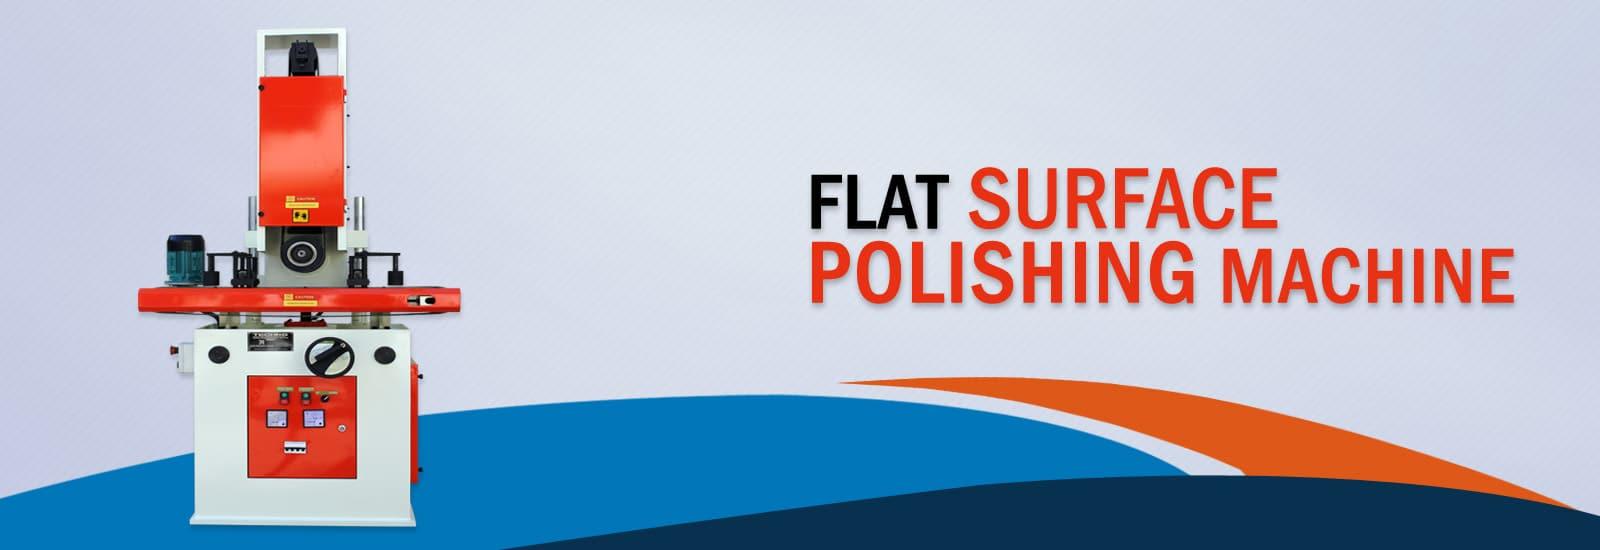 Flat-Surface-Polishing-Machine-Banner